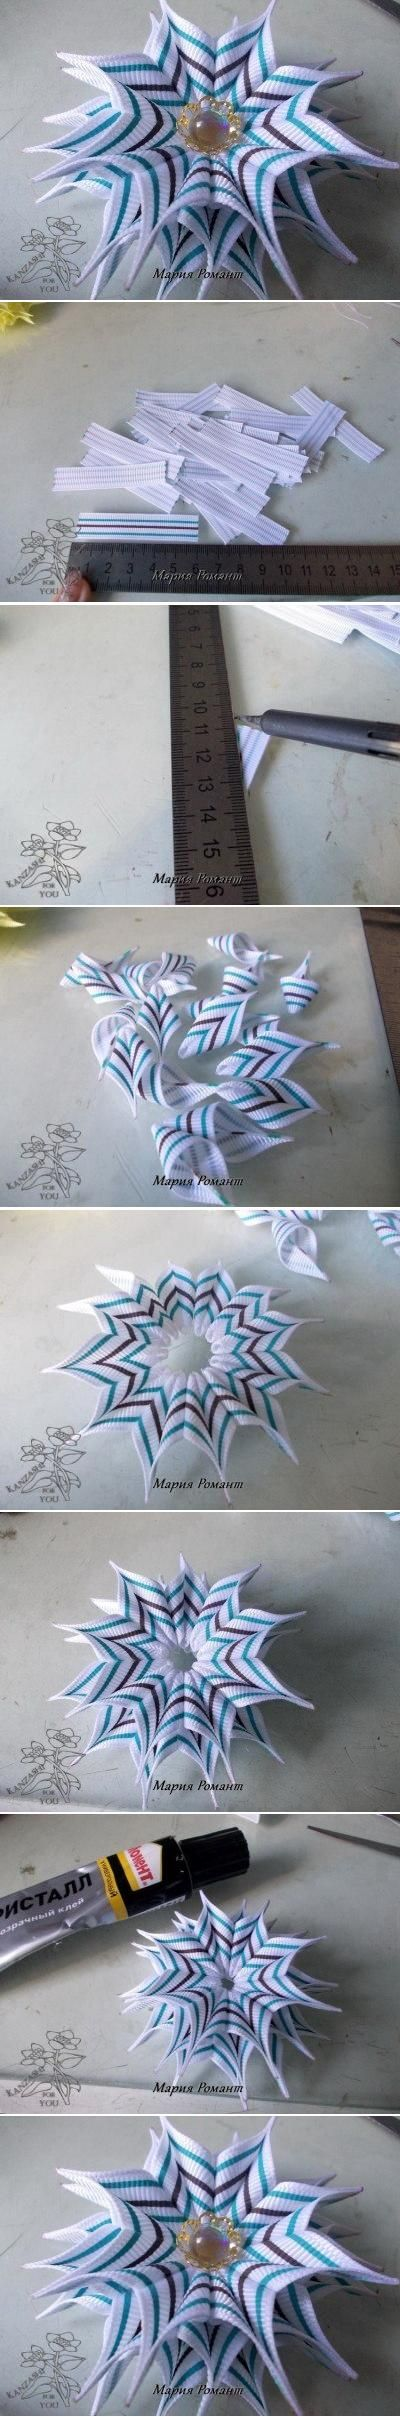 DIY Modular Prickle Flower or Star